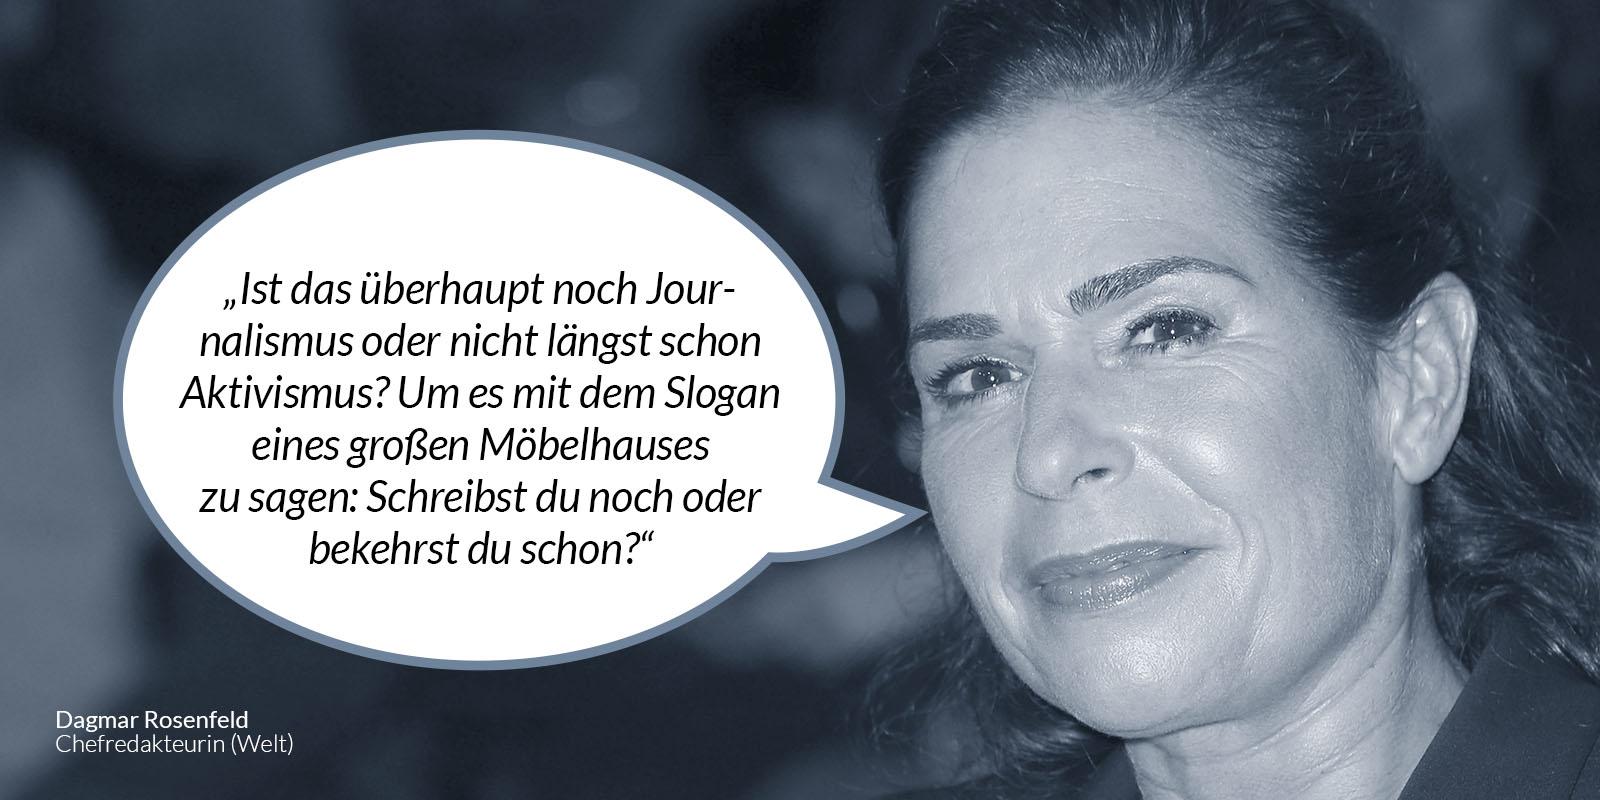 Dagmar Rosenfeld